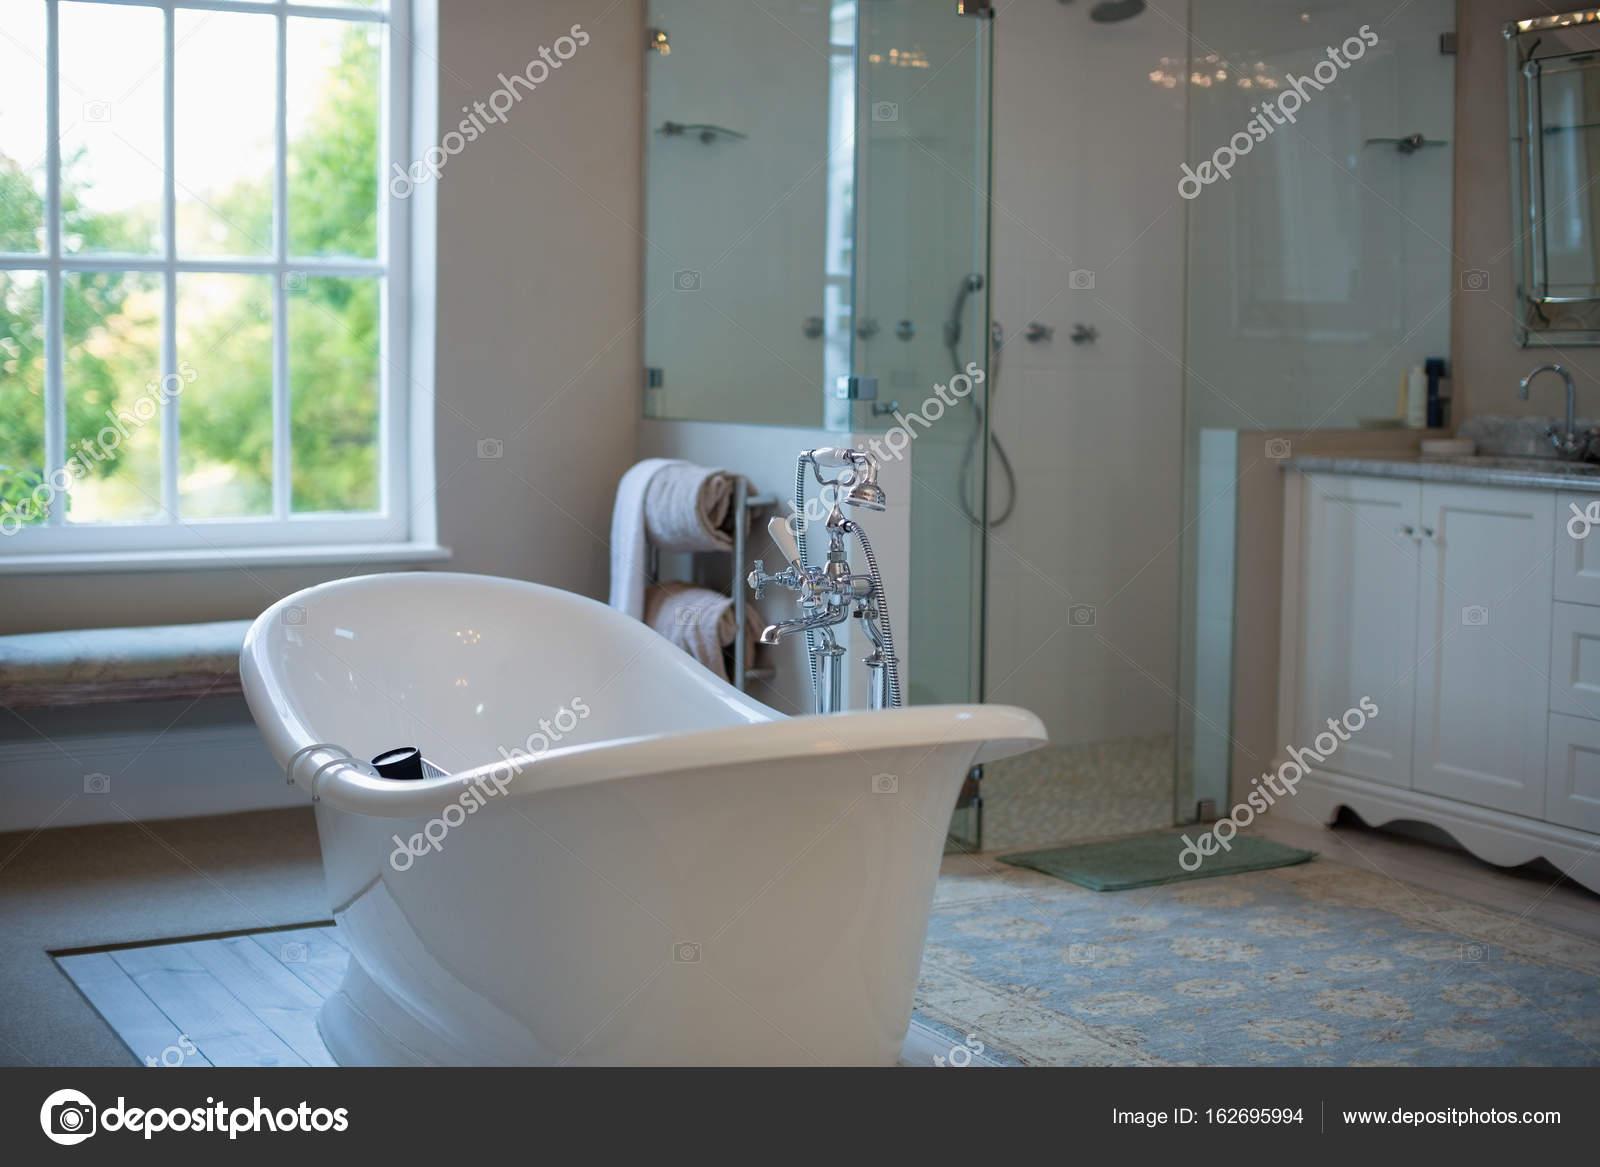 Vasca Da Bagno Vista : Vista della vasca da bagno vuota u foto stock wavebreakmedia